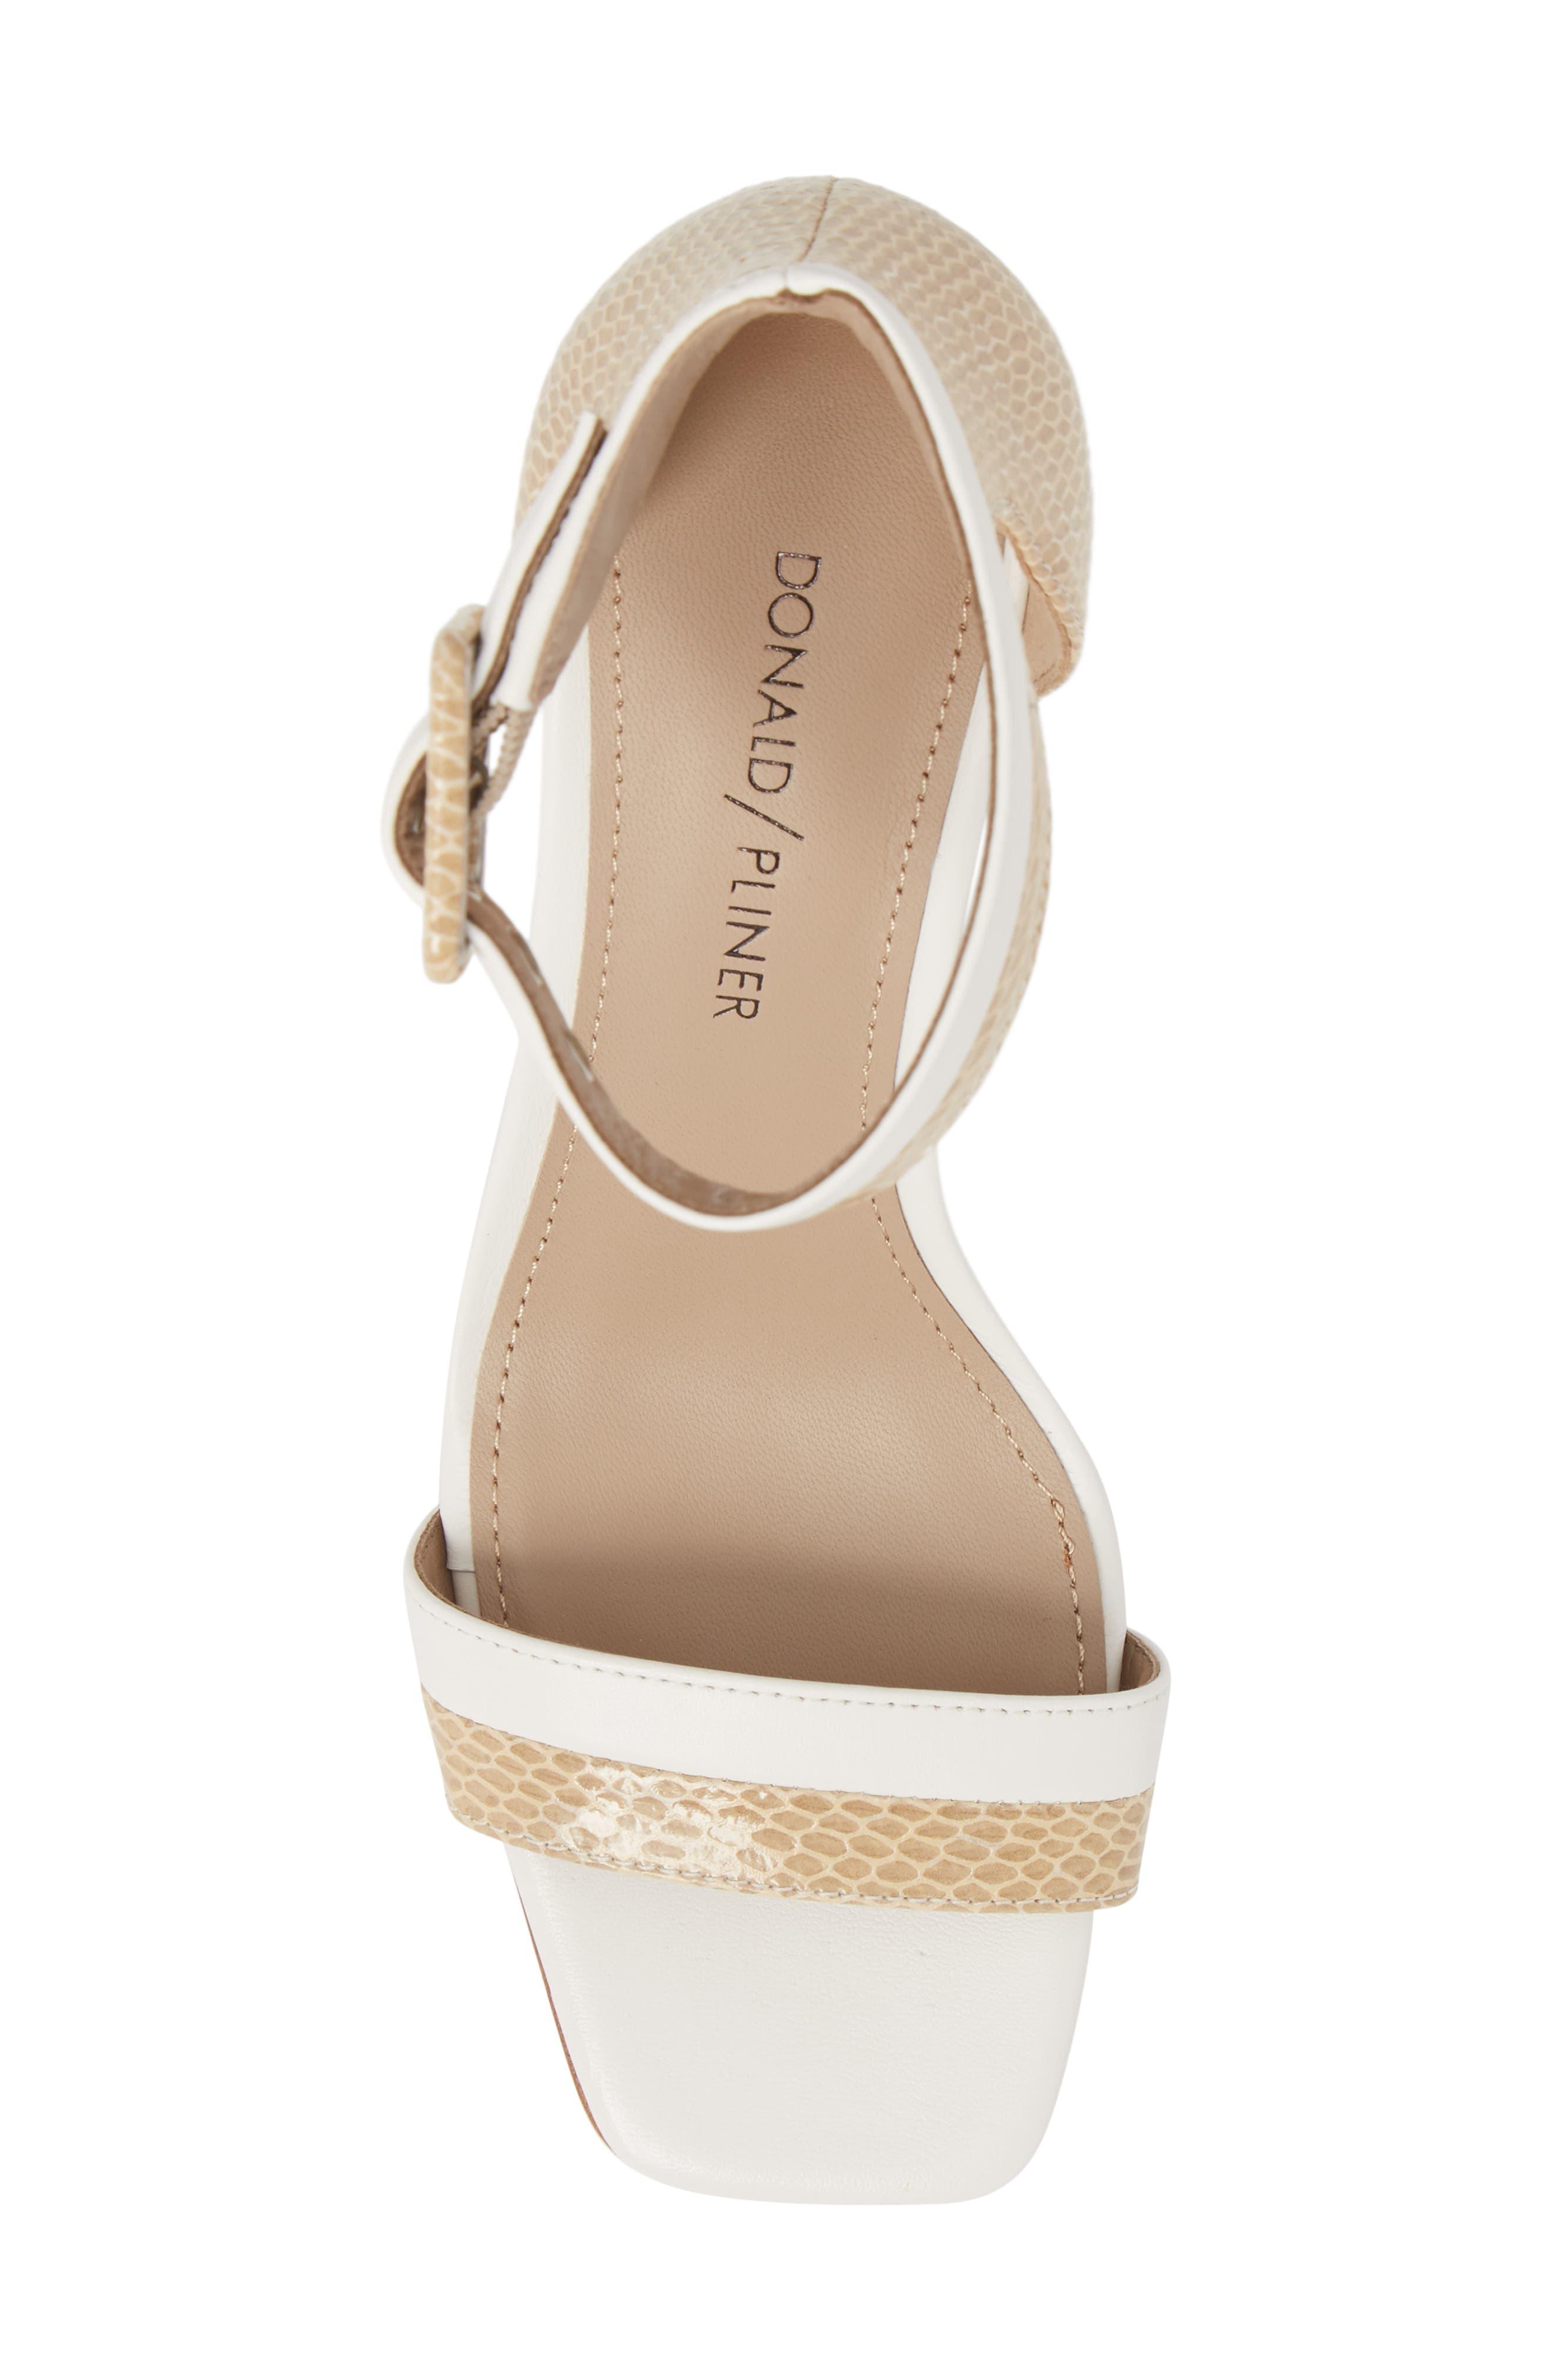 DONALD PLINER,                             Watson Ankle Strap Sandal,                             Alternate thumbnail 5, color,                             250